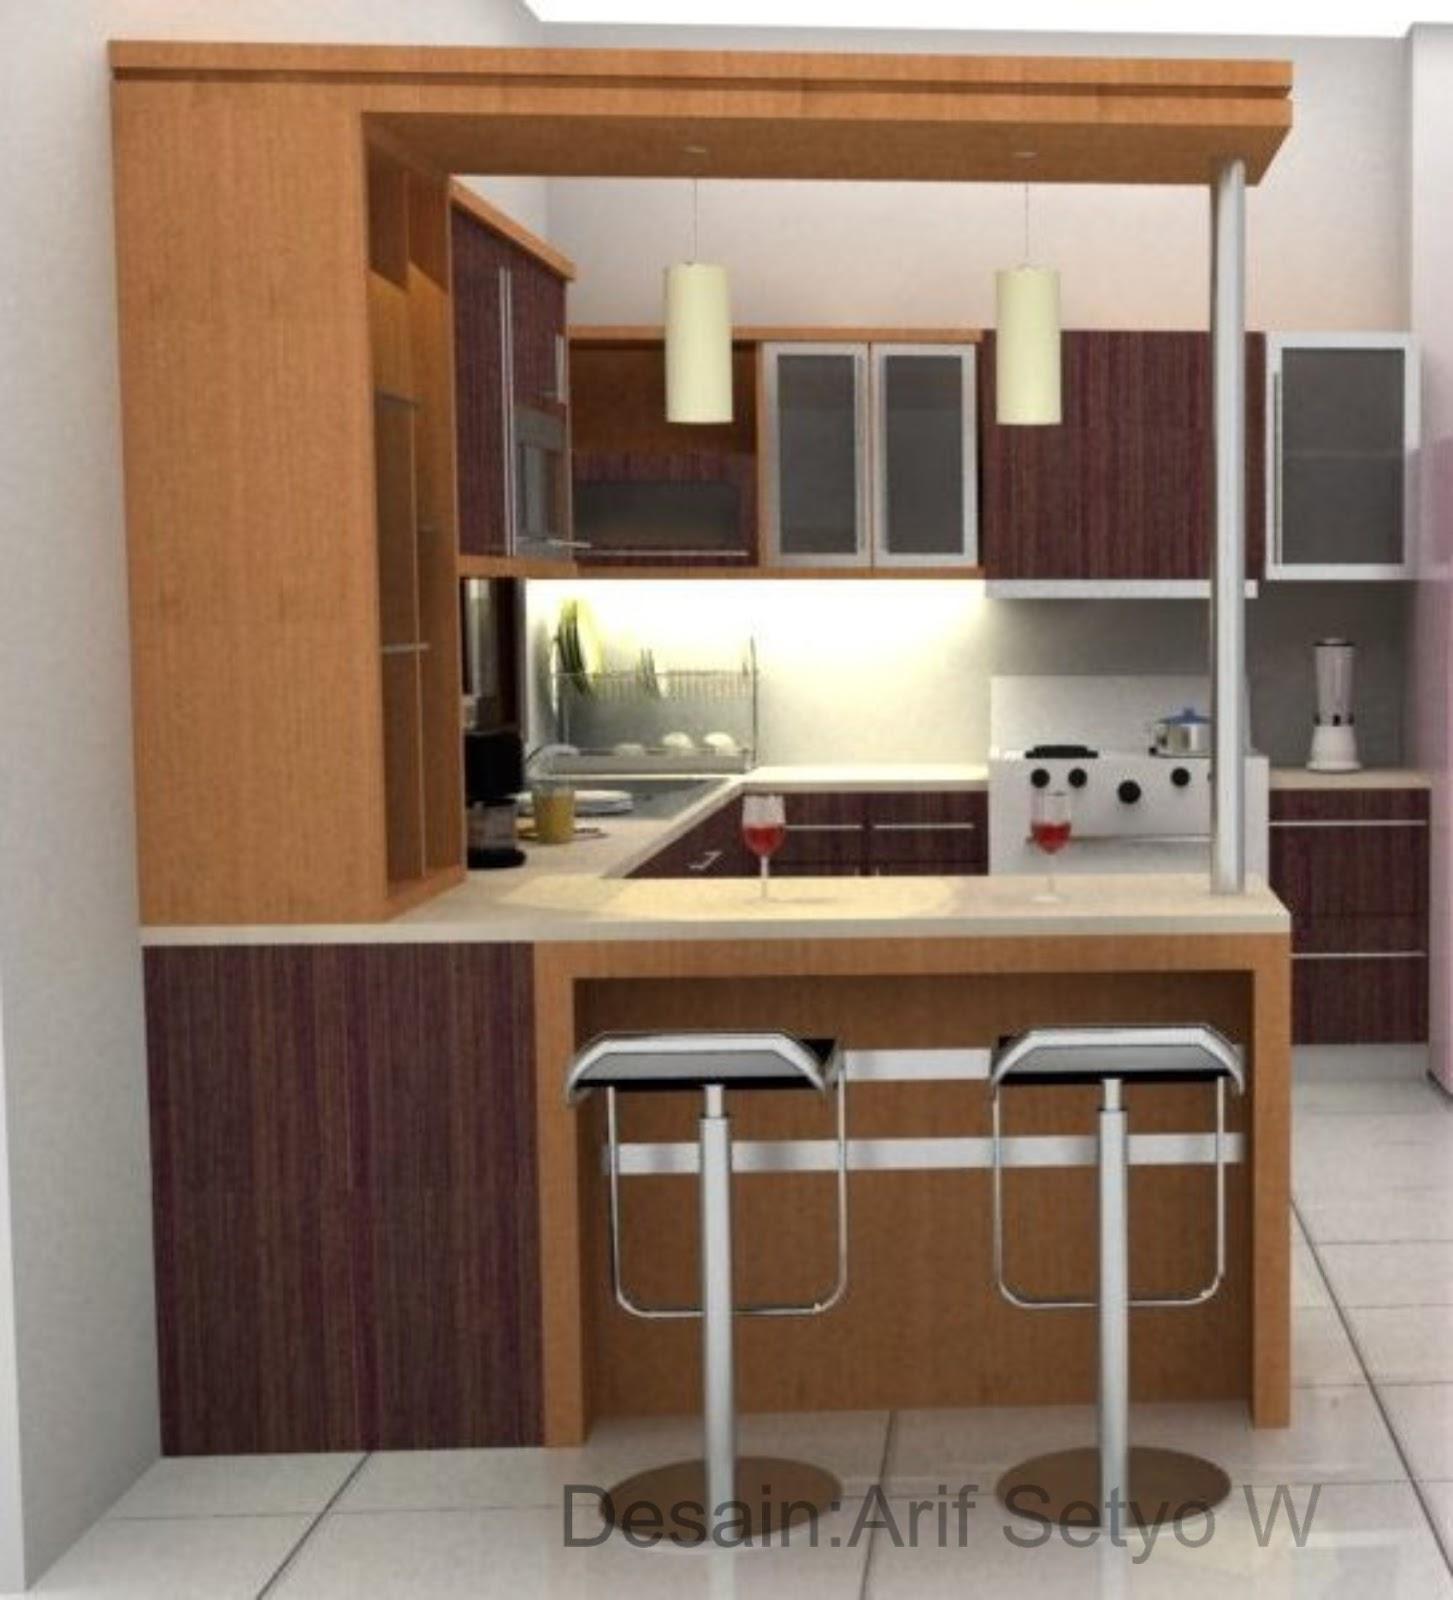 Kitchen Set Rumah: DESAIN DAPUR DAN KITCHEN SET